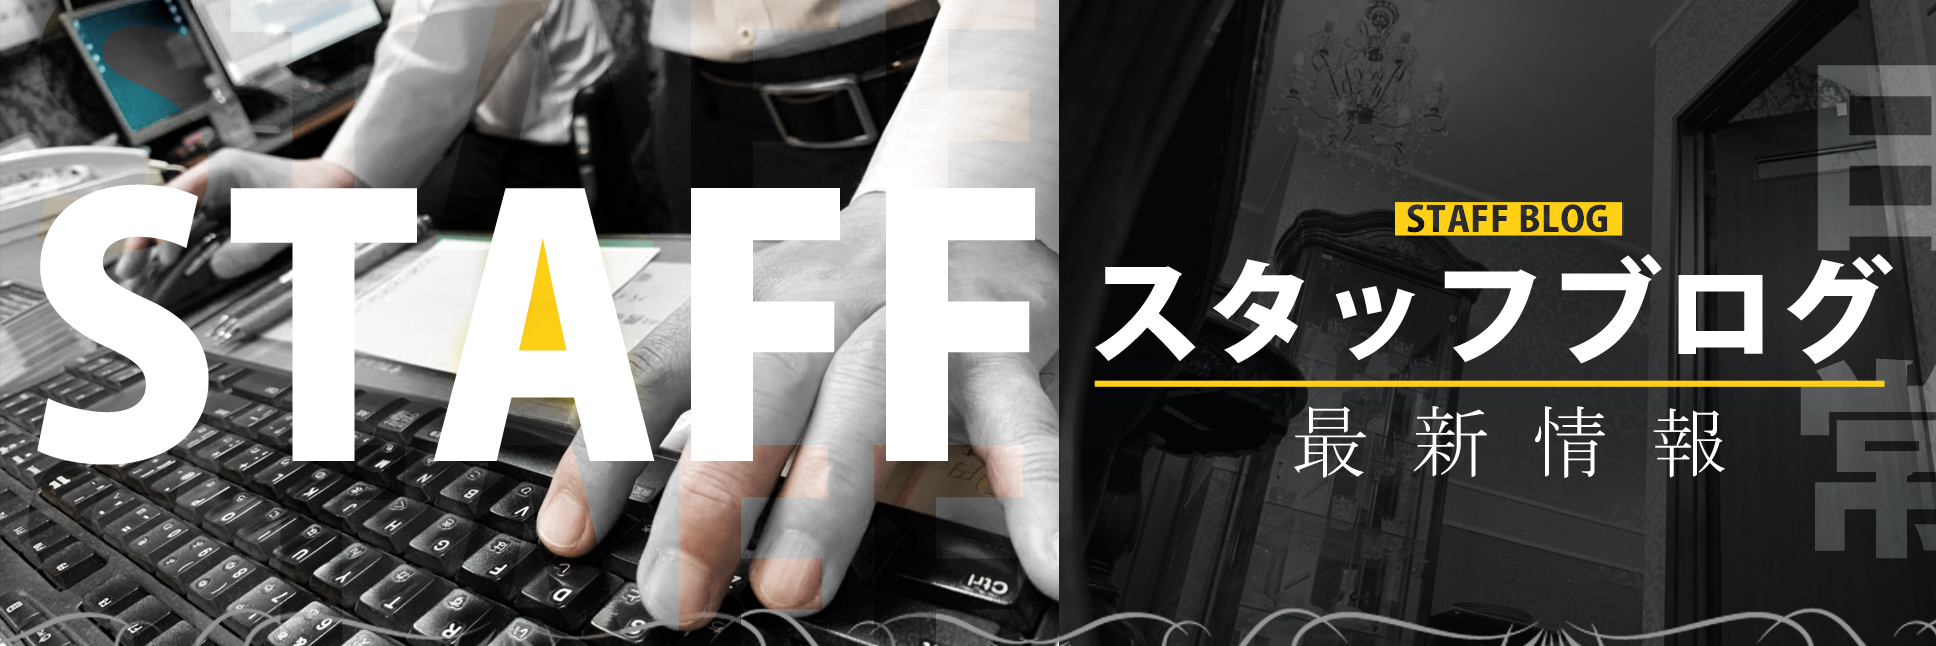 SATFFブログ